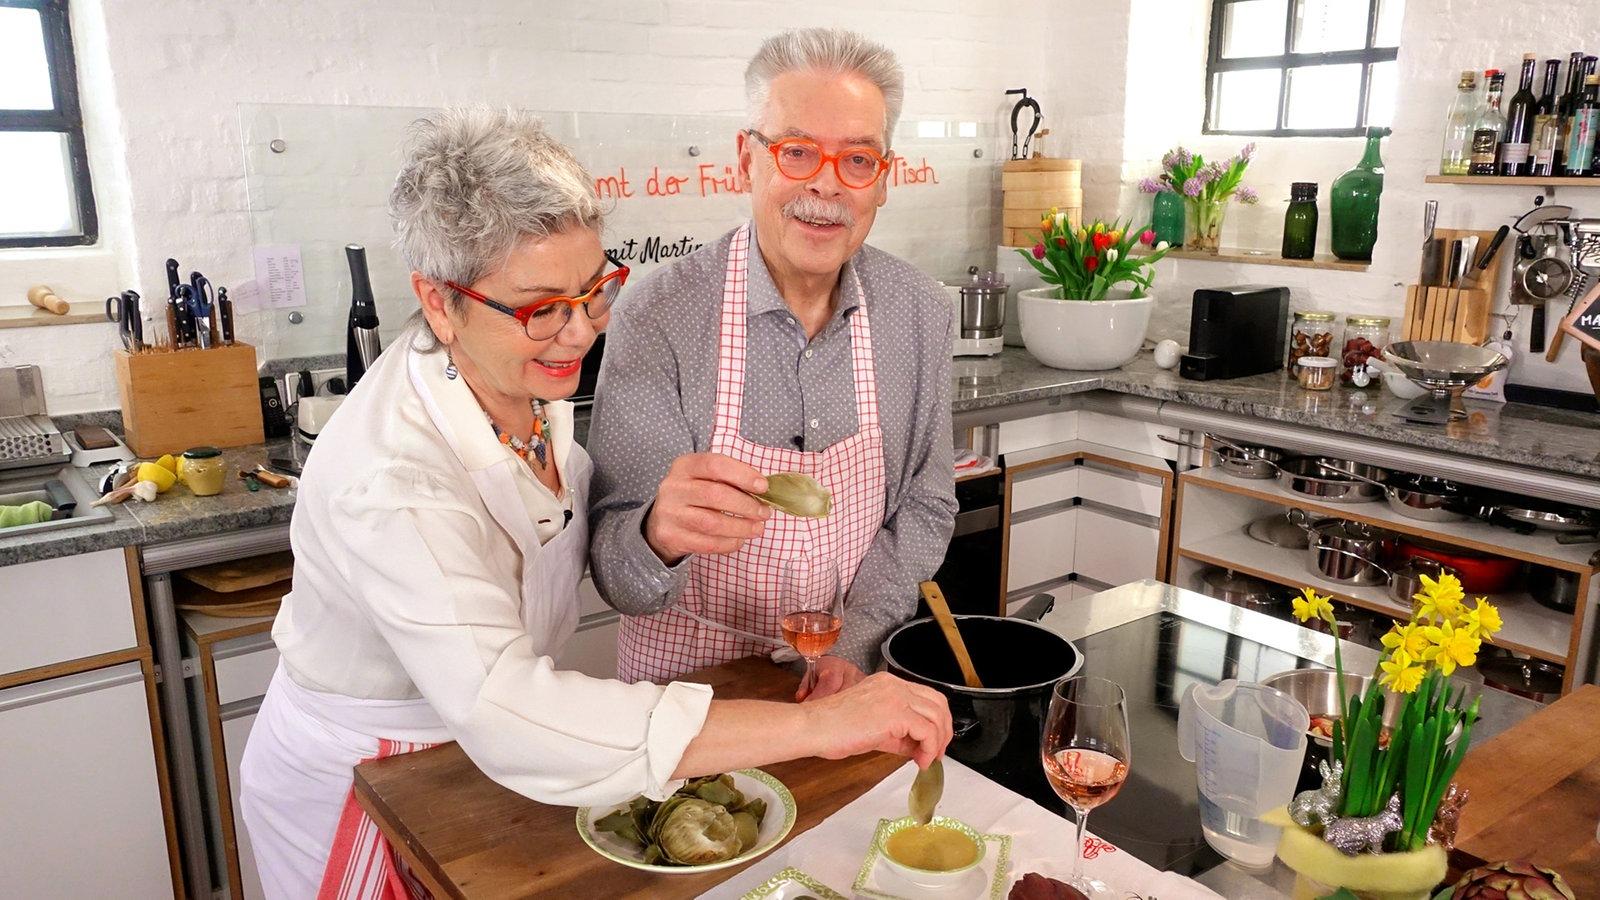 Wdr Mediathek Kochen Mit Martina Und Moritz Rezepte